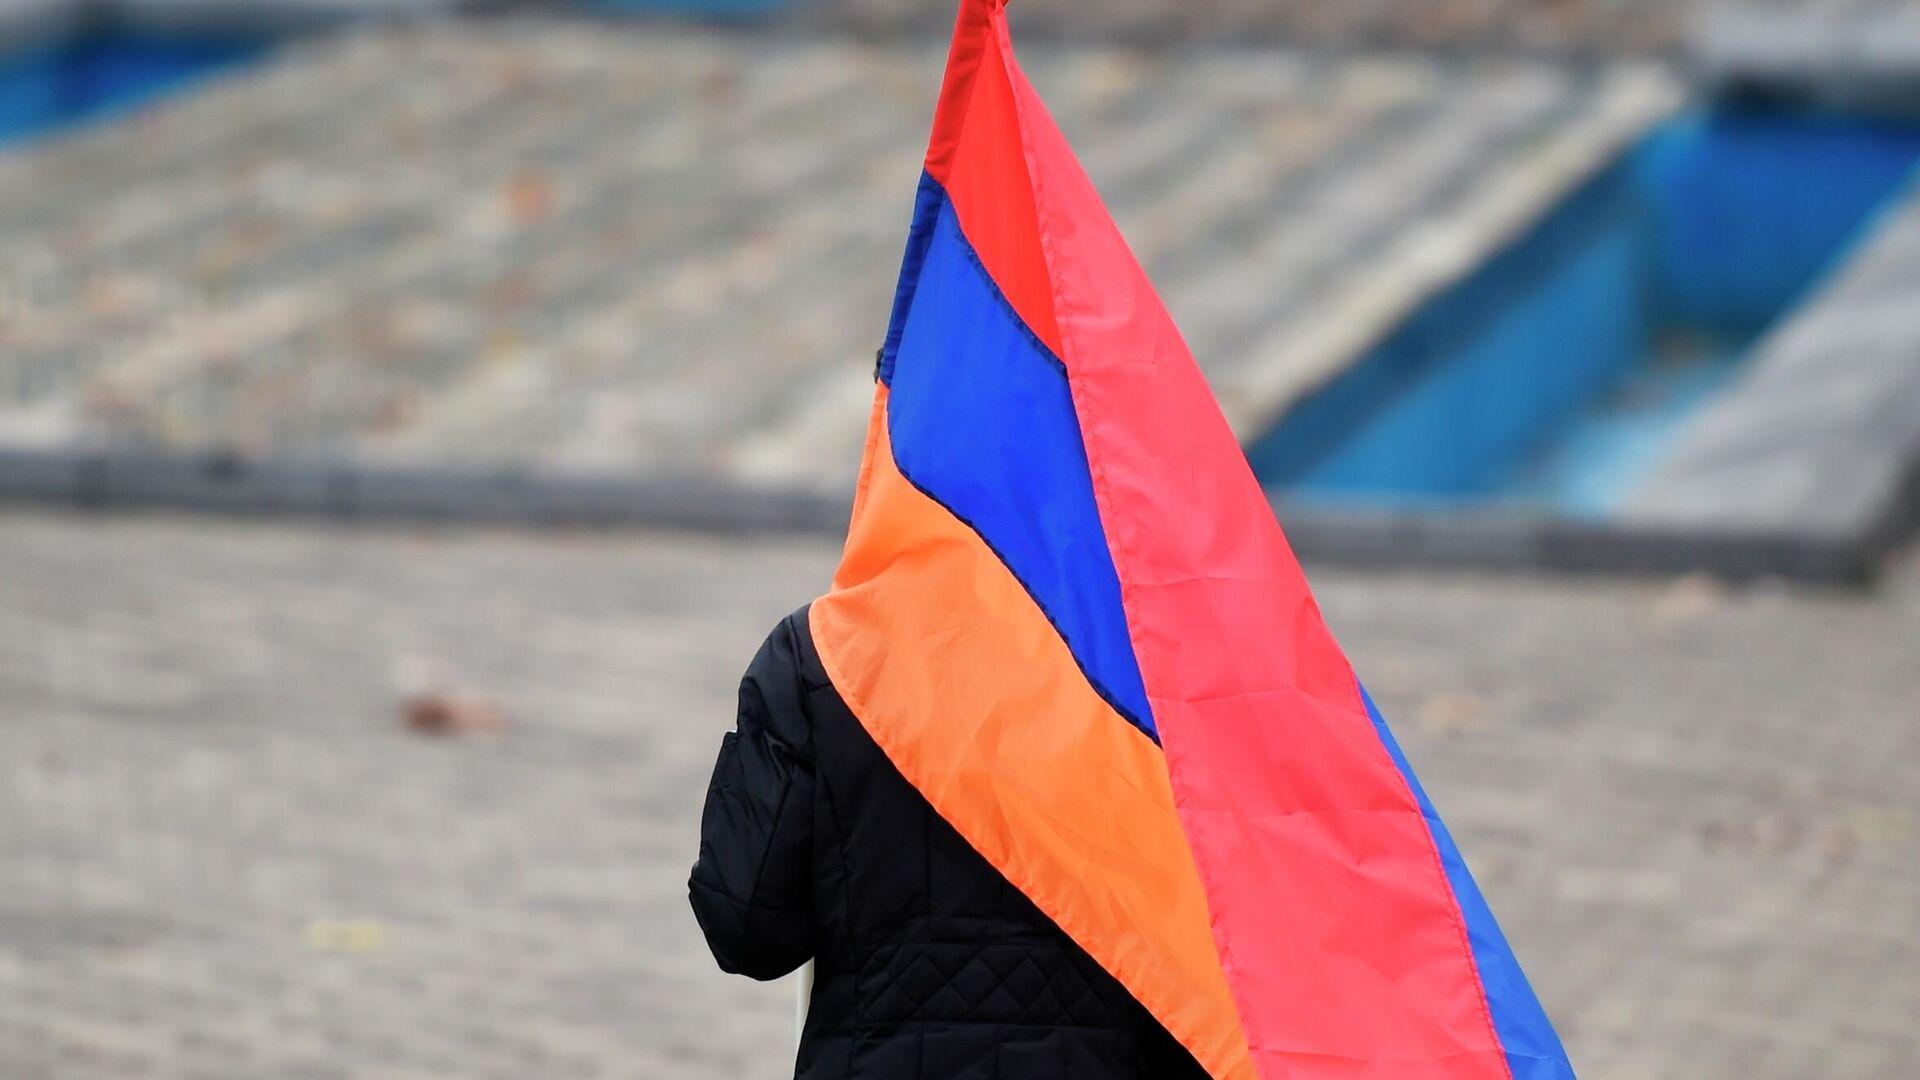 Сторонник оппозиции идет с флагом на митинг на площади Республики в Ереване - РИА Новости, 1920, 22.12.2020